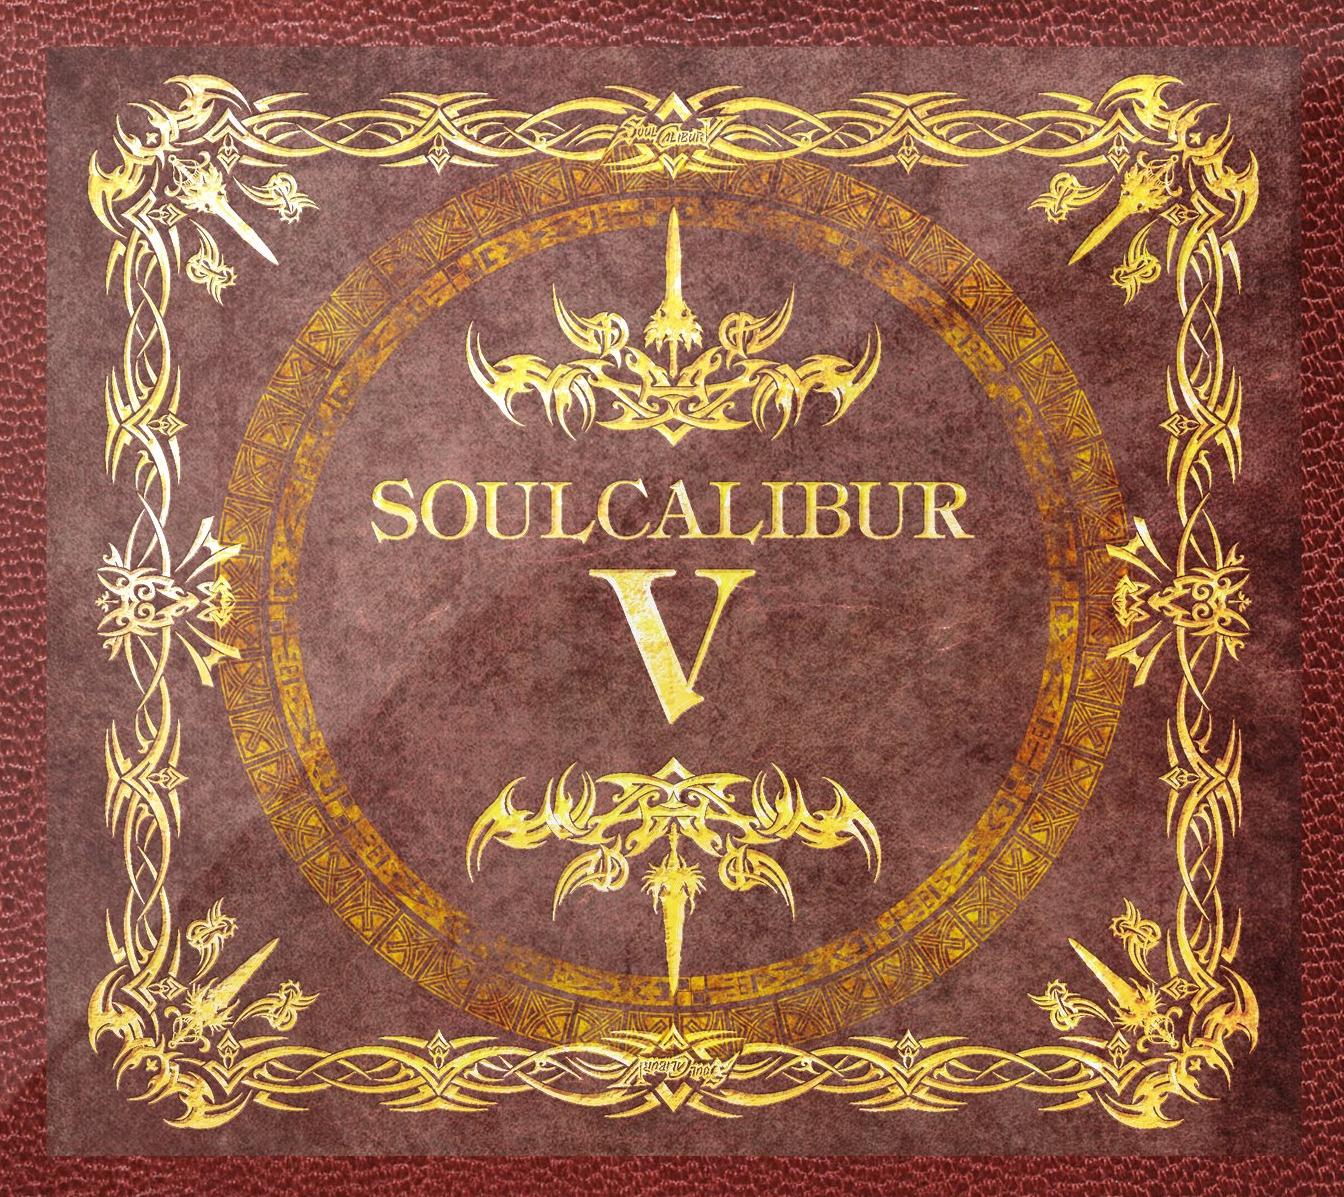 soulcaliburost